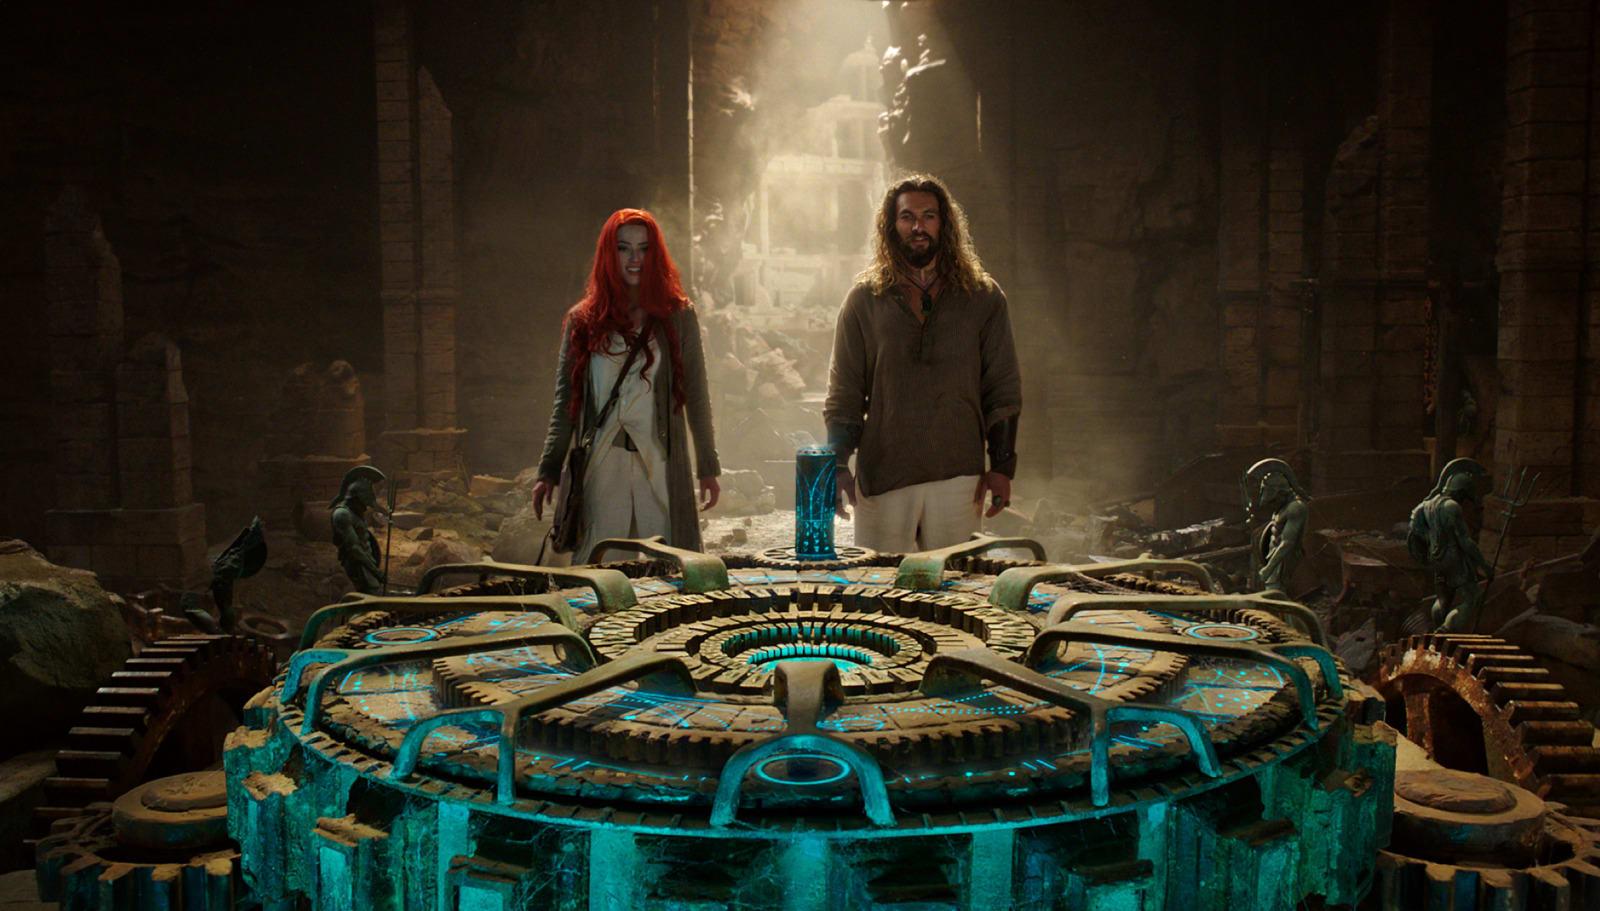 AMBER HEARD as Mera and JASON MOMOA could return for Aquaman 2